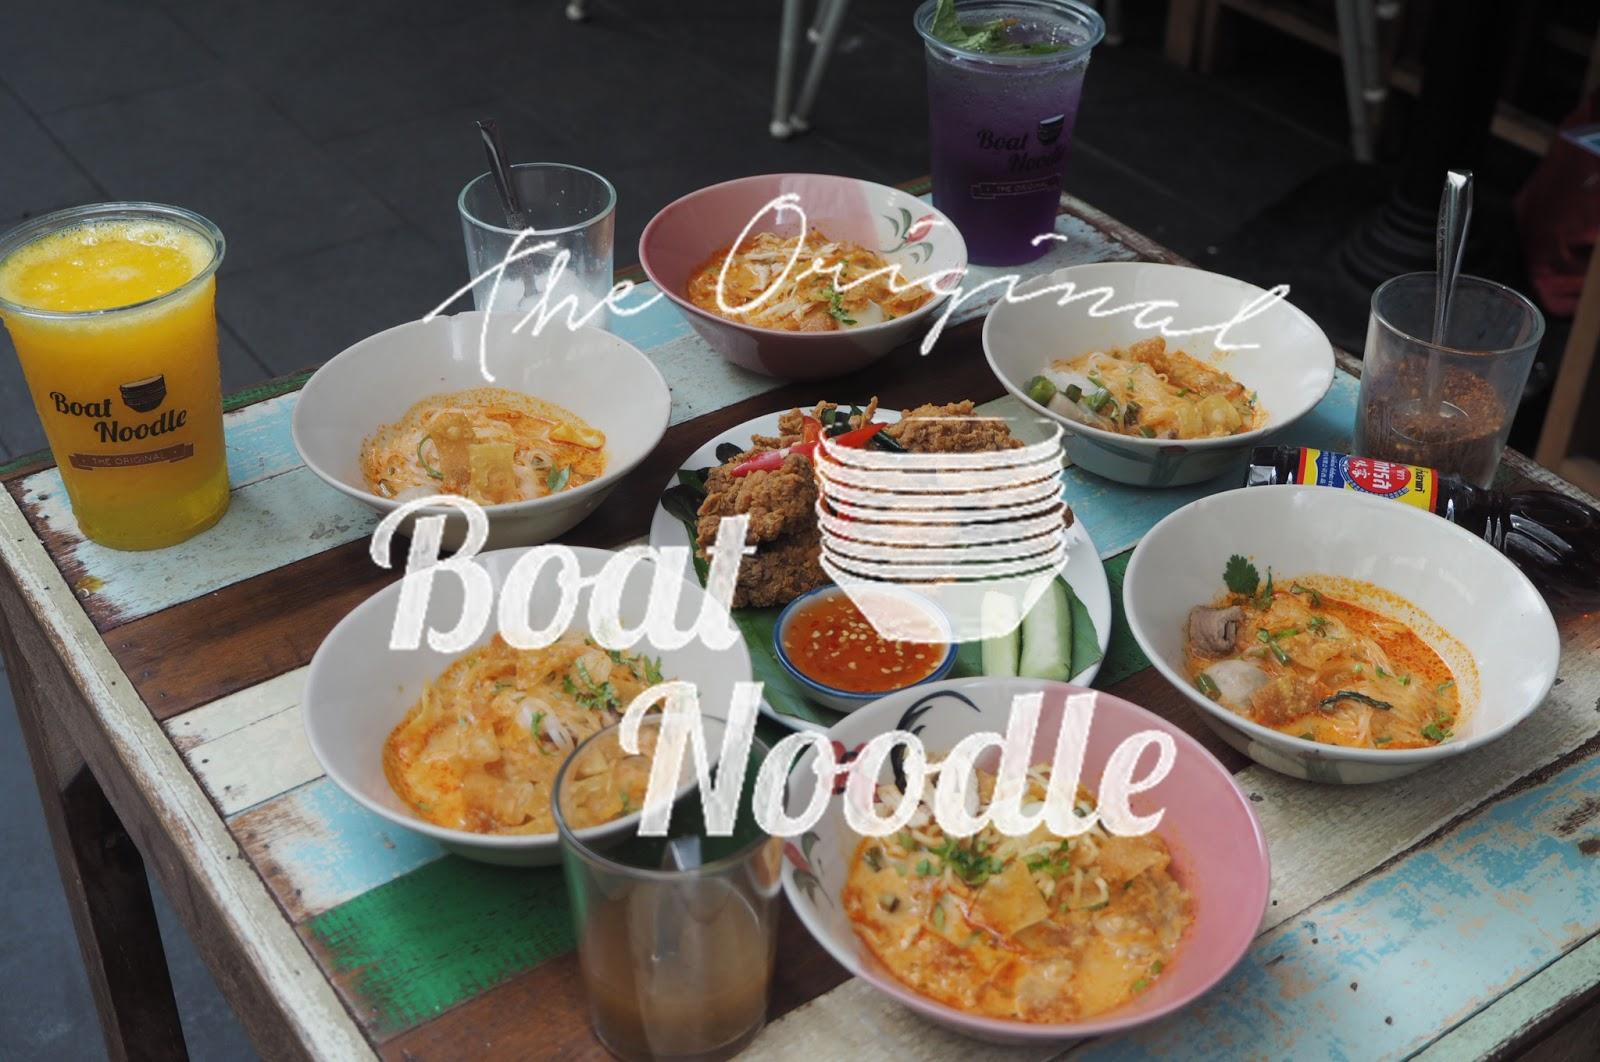 [Food Review] Prosperity YUM Menu @ Boat Noodle, Empire Damansara